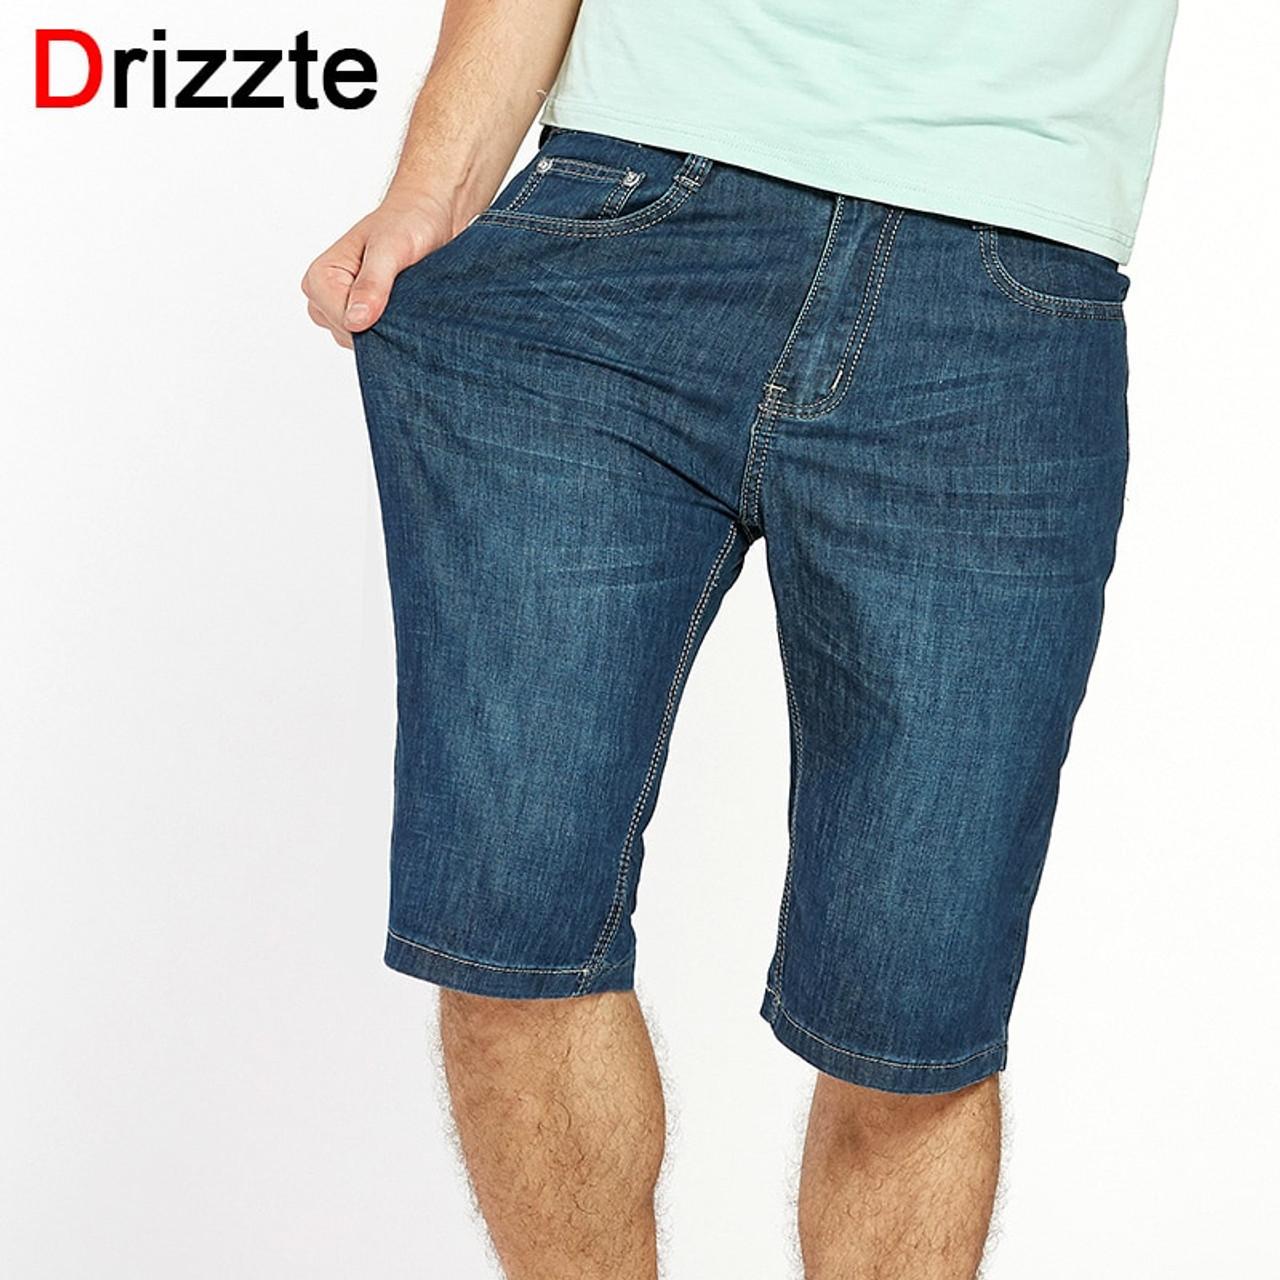 8ee8a32aa56 Drizzte Summer Fashion Mens Jeans Stretch Denim Plus Size Jeans Shorts  Pants Trouser Size 42 44 ...